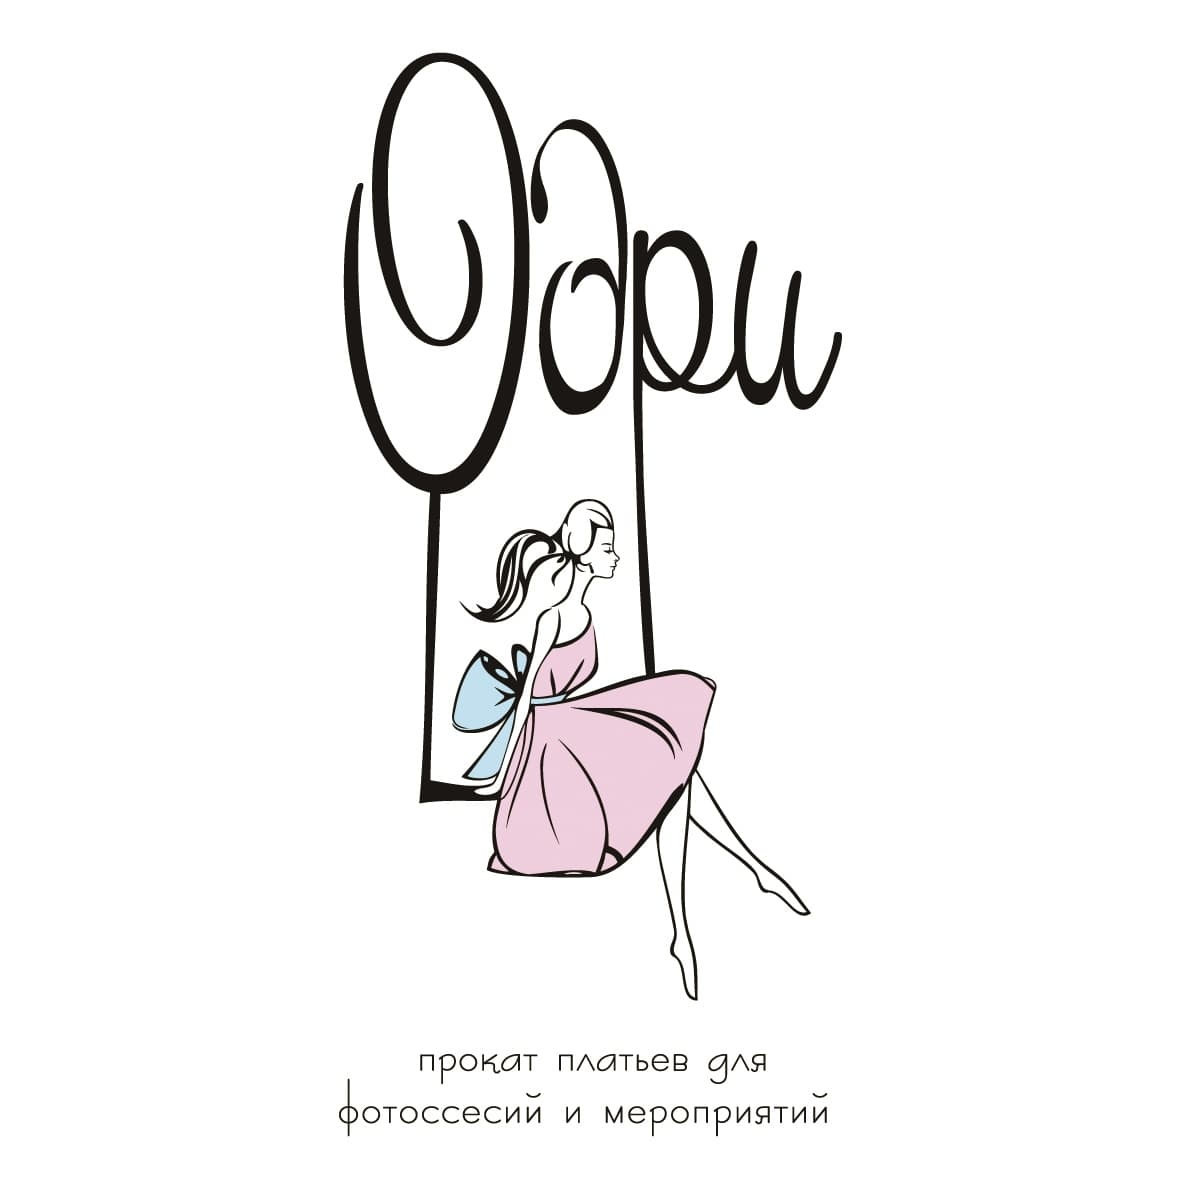 прокат платьев одри логотип